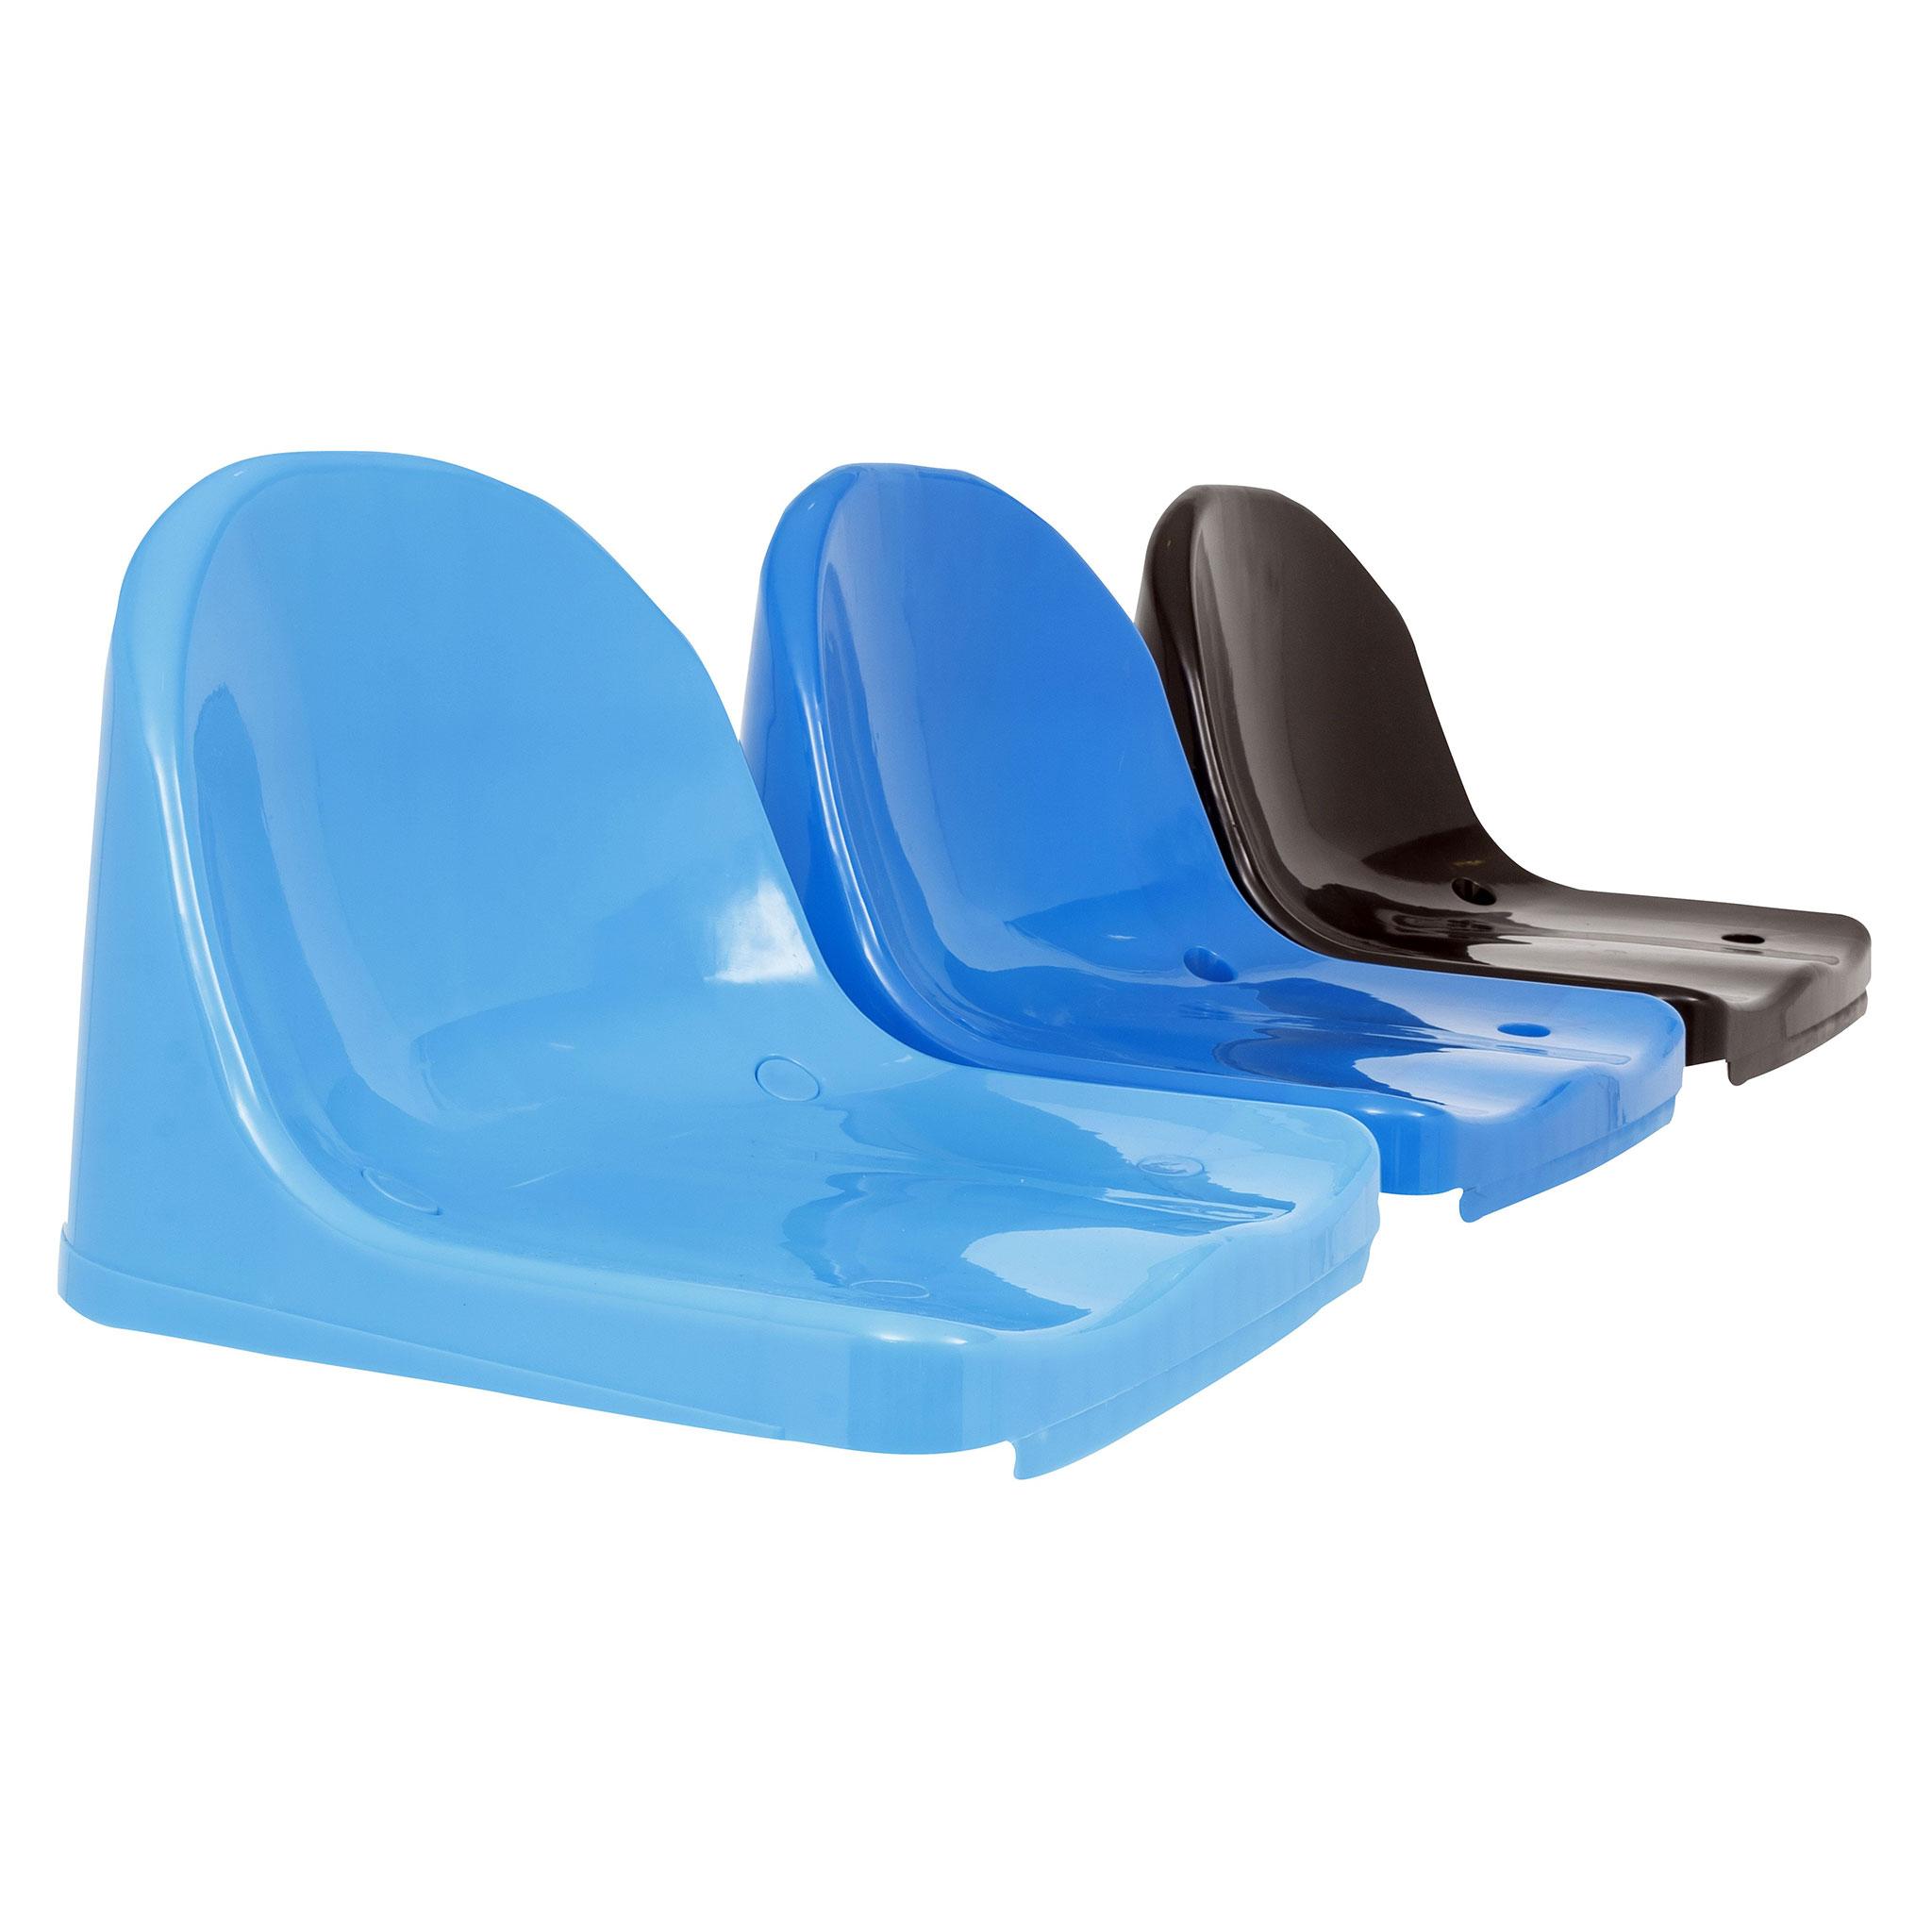 beta_backrest_monoblock_copolymer_pp_stadium_chair_seatorium_06